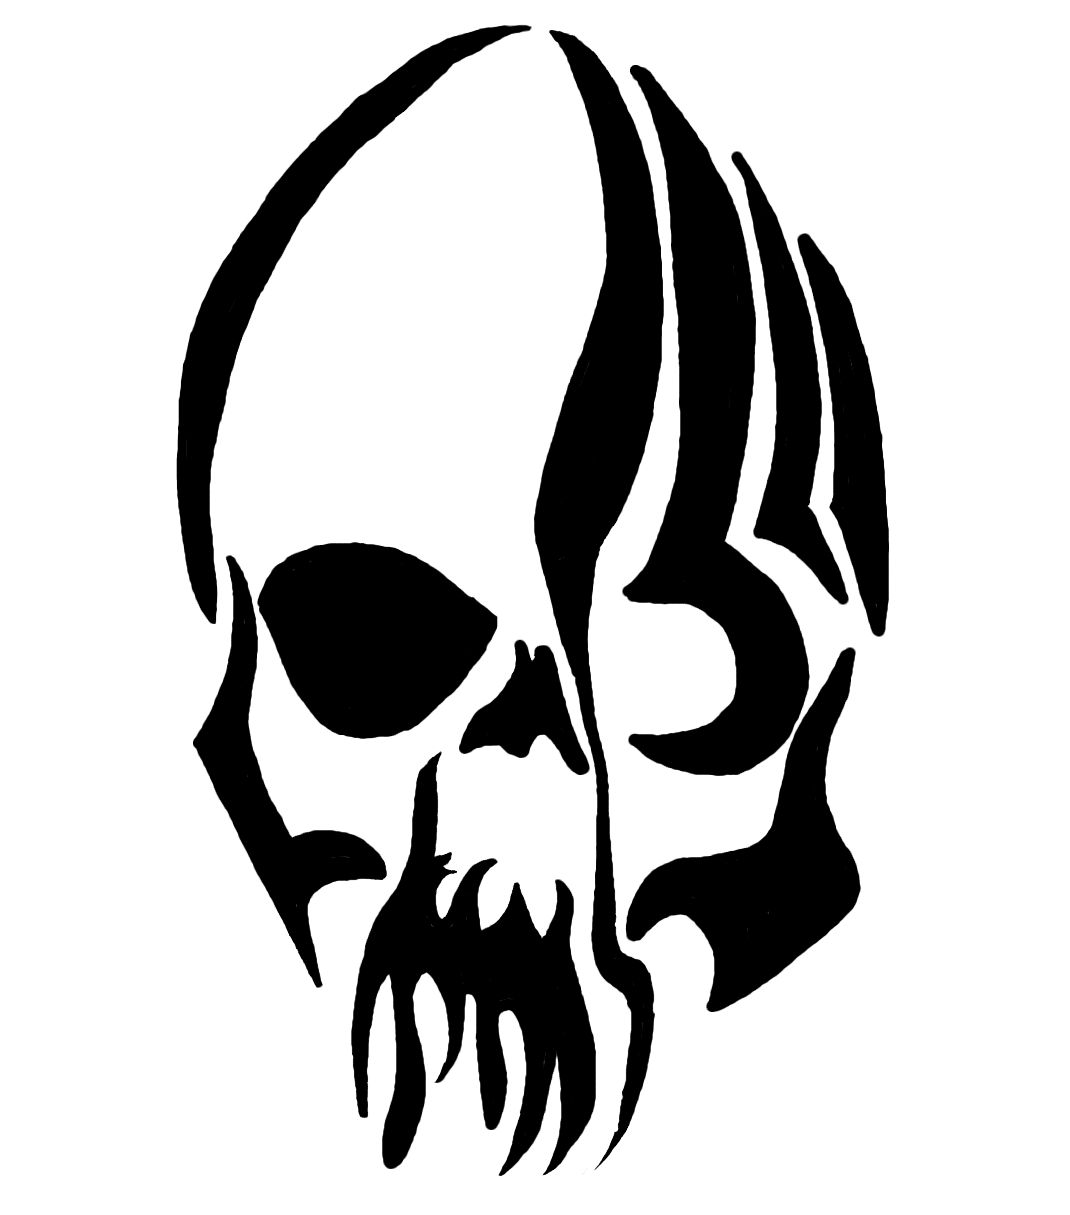 Tribal Skull Tattoos Png image #19371 - Tribal Skull Tattoos PNG